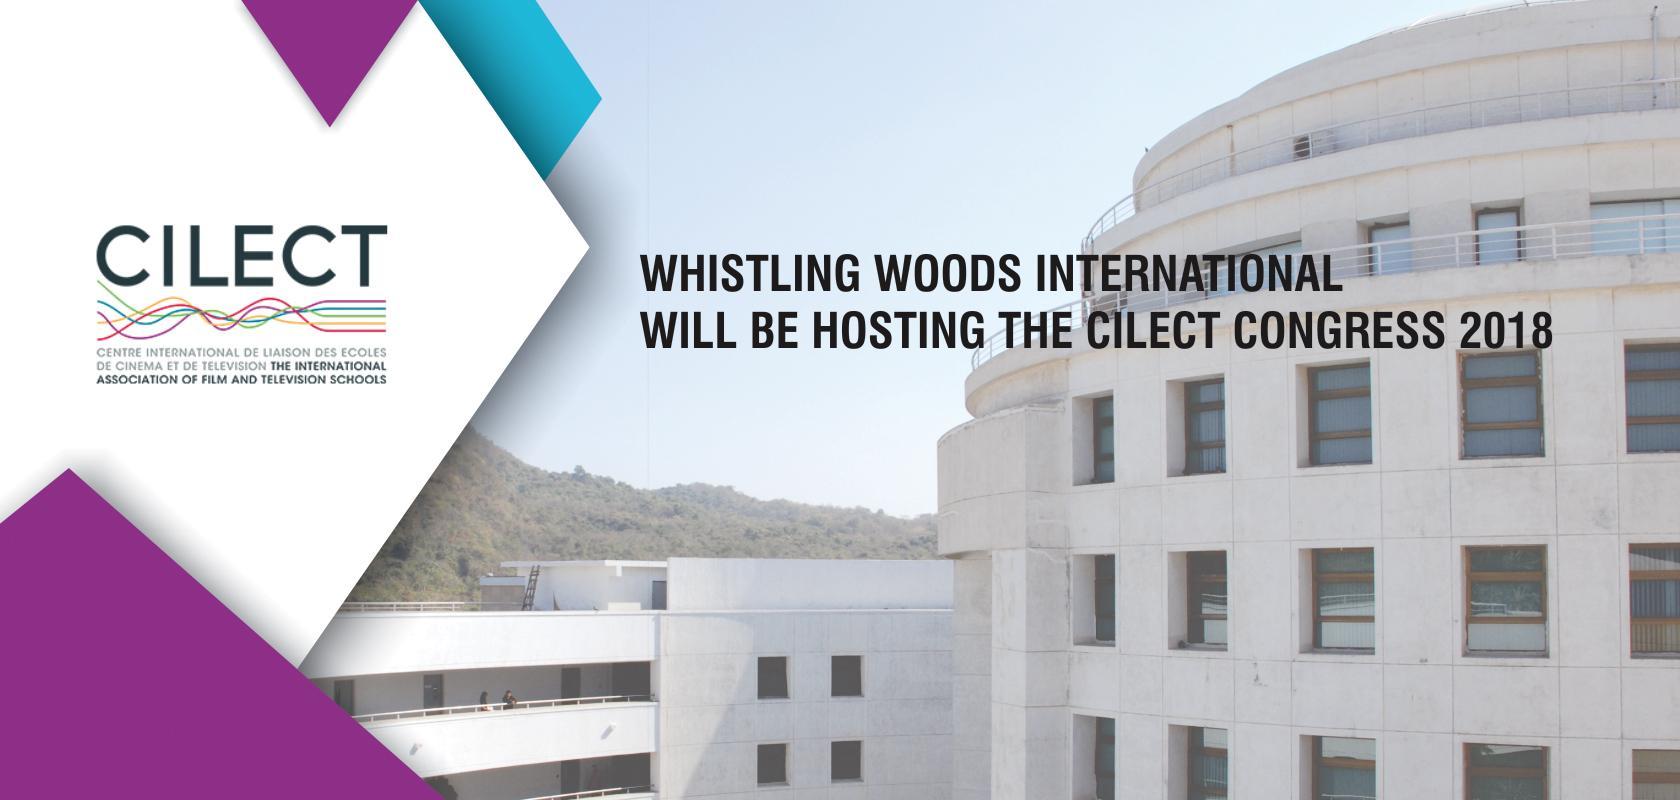 Whistling Woods School of Filmmaking, Mumbai, India